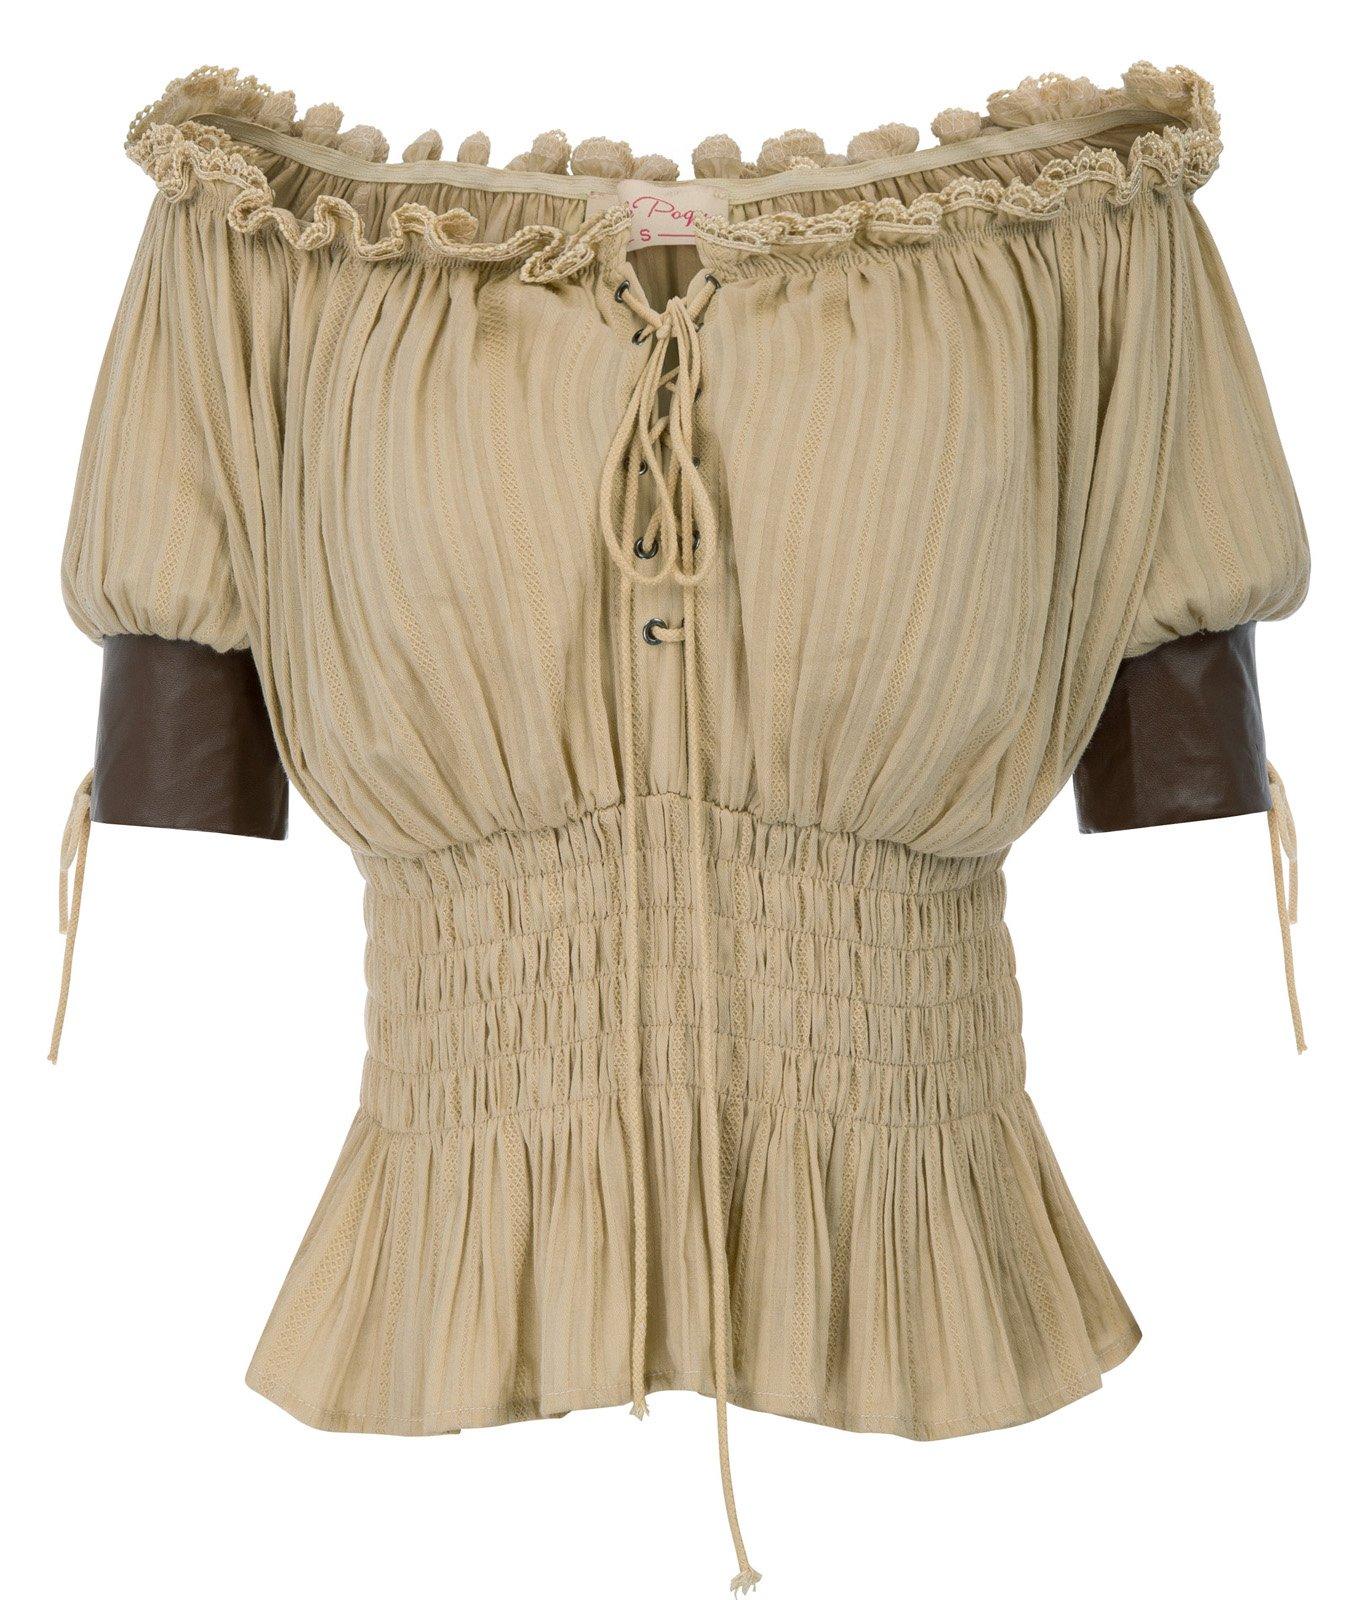 Belle Poque Women Steampunk Half Sleeve T Shirts Tops Gothic Boho Tee Shirts BP581-2 L Kaki